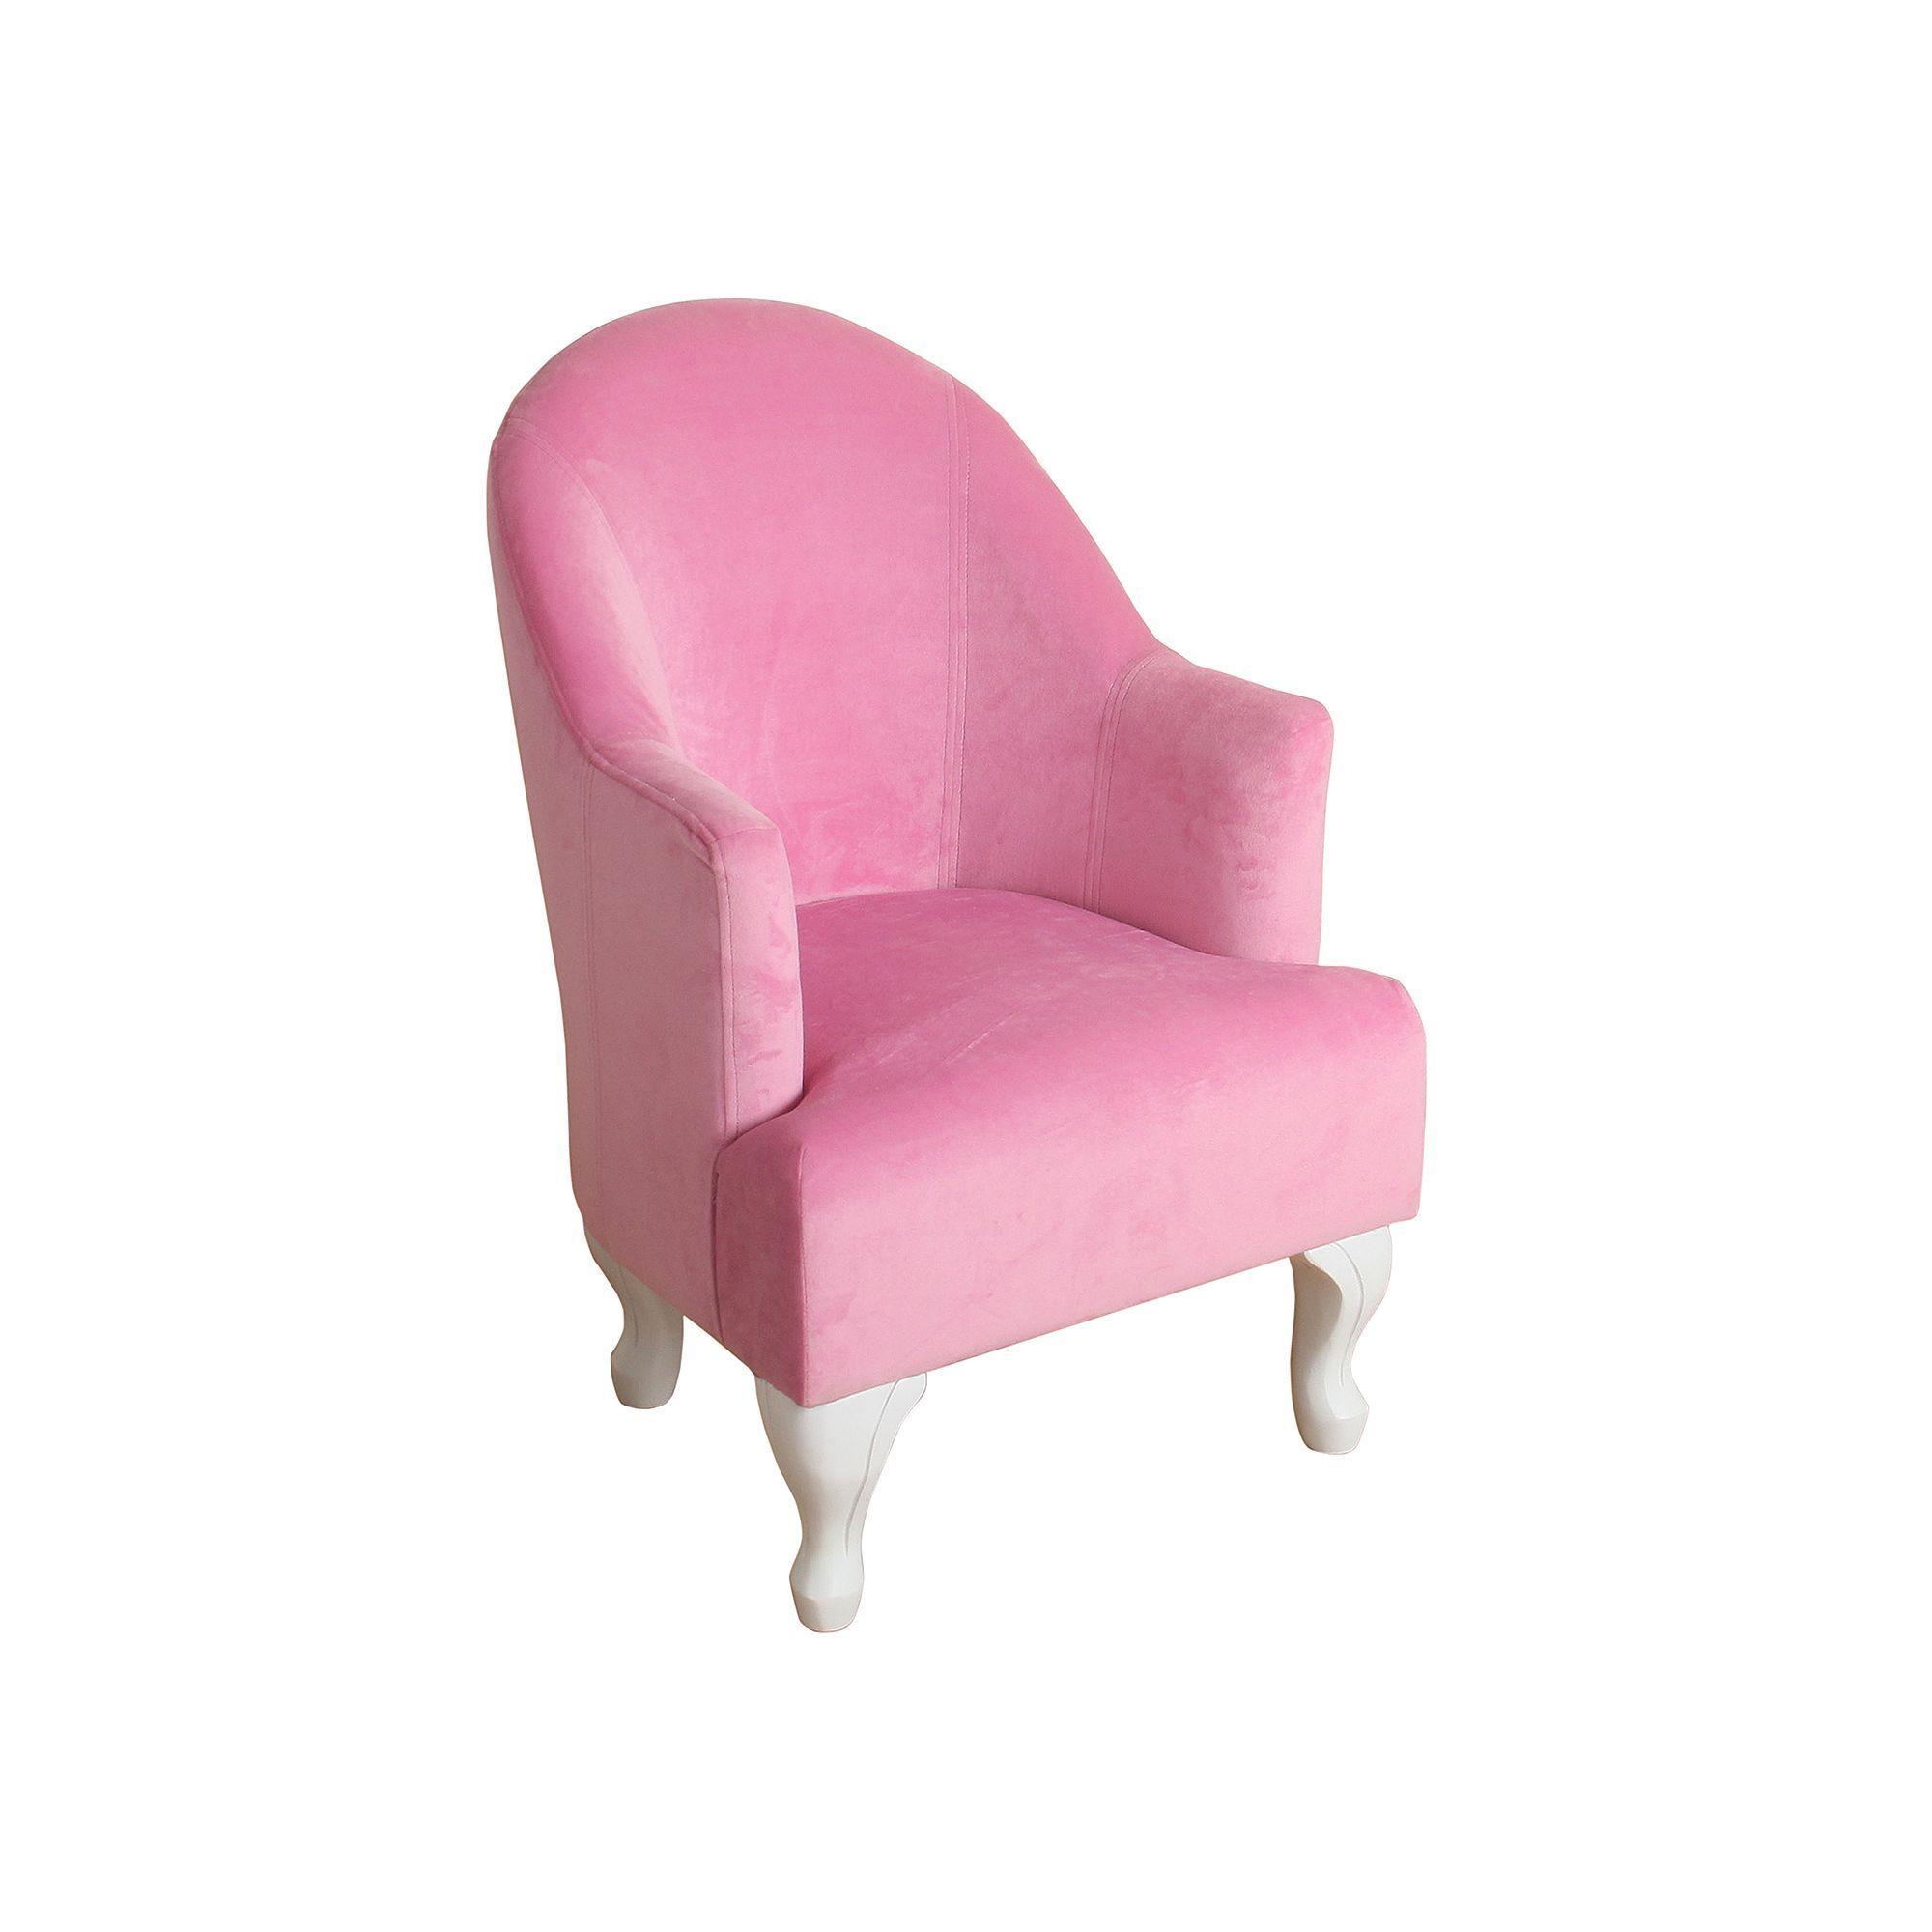 HomePop Kids Velvet Accent Chair Pink